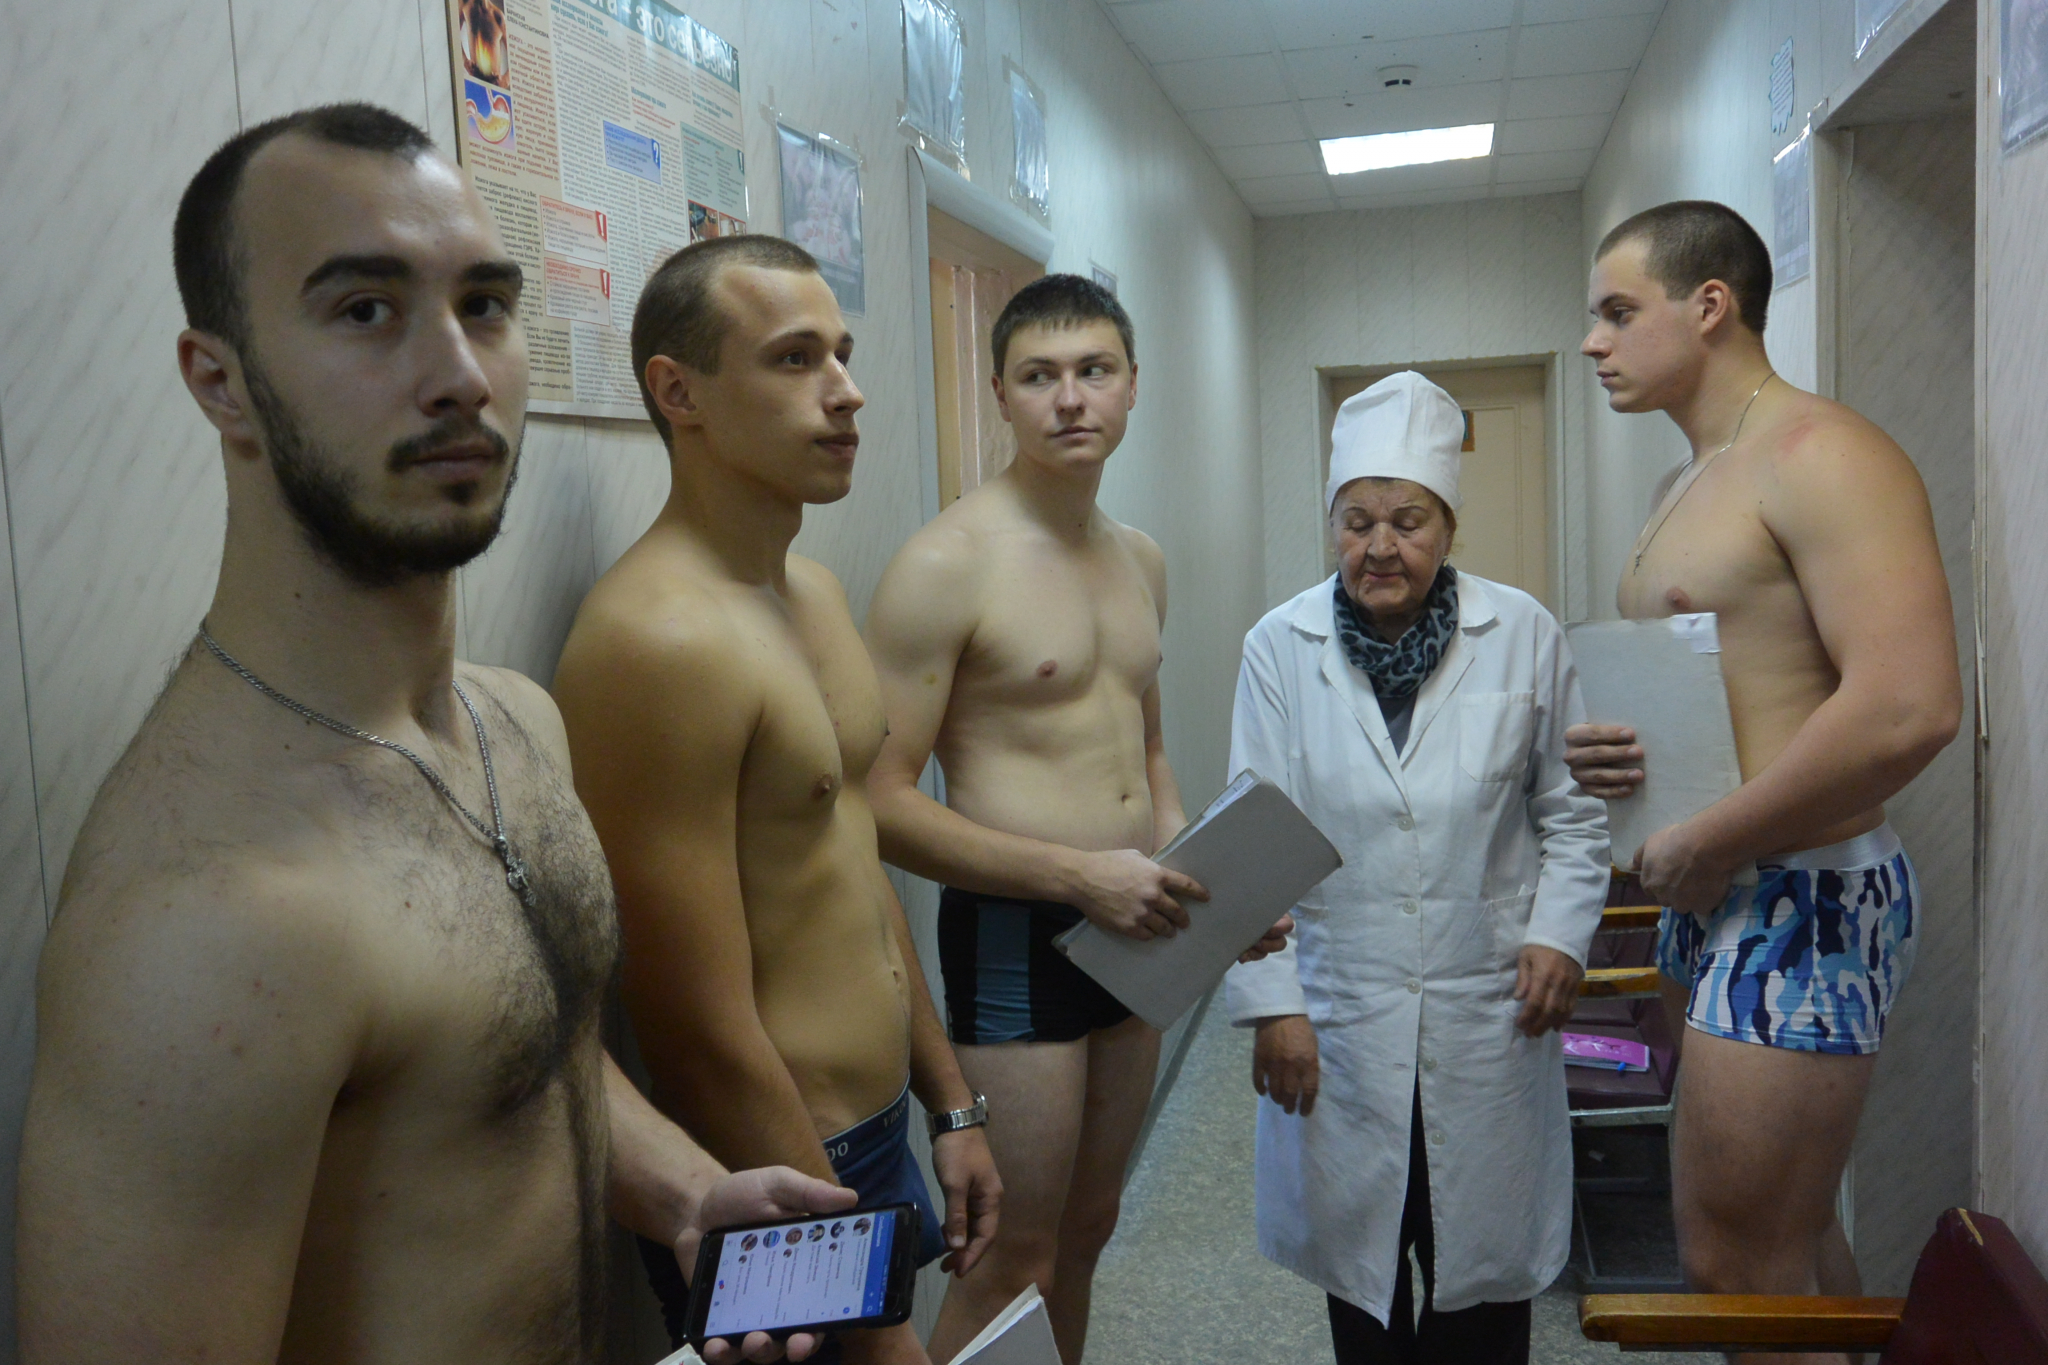 voennie-telki-na-komissii-porno-tri-devki-sut-vo-vremya-traha-s-muzhikom